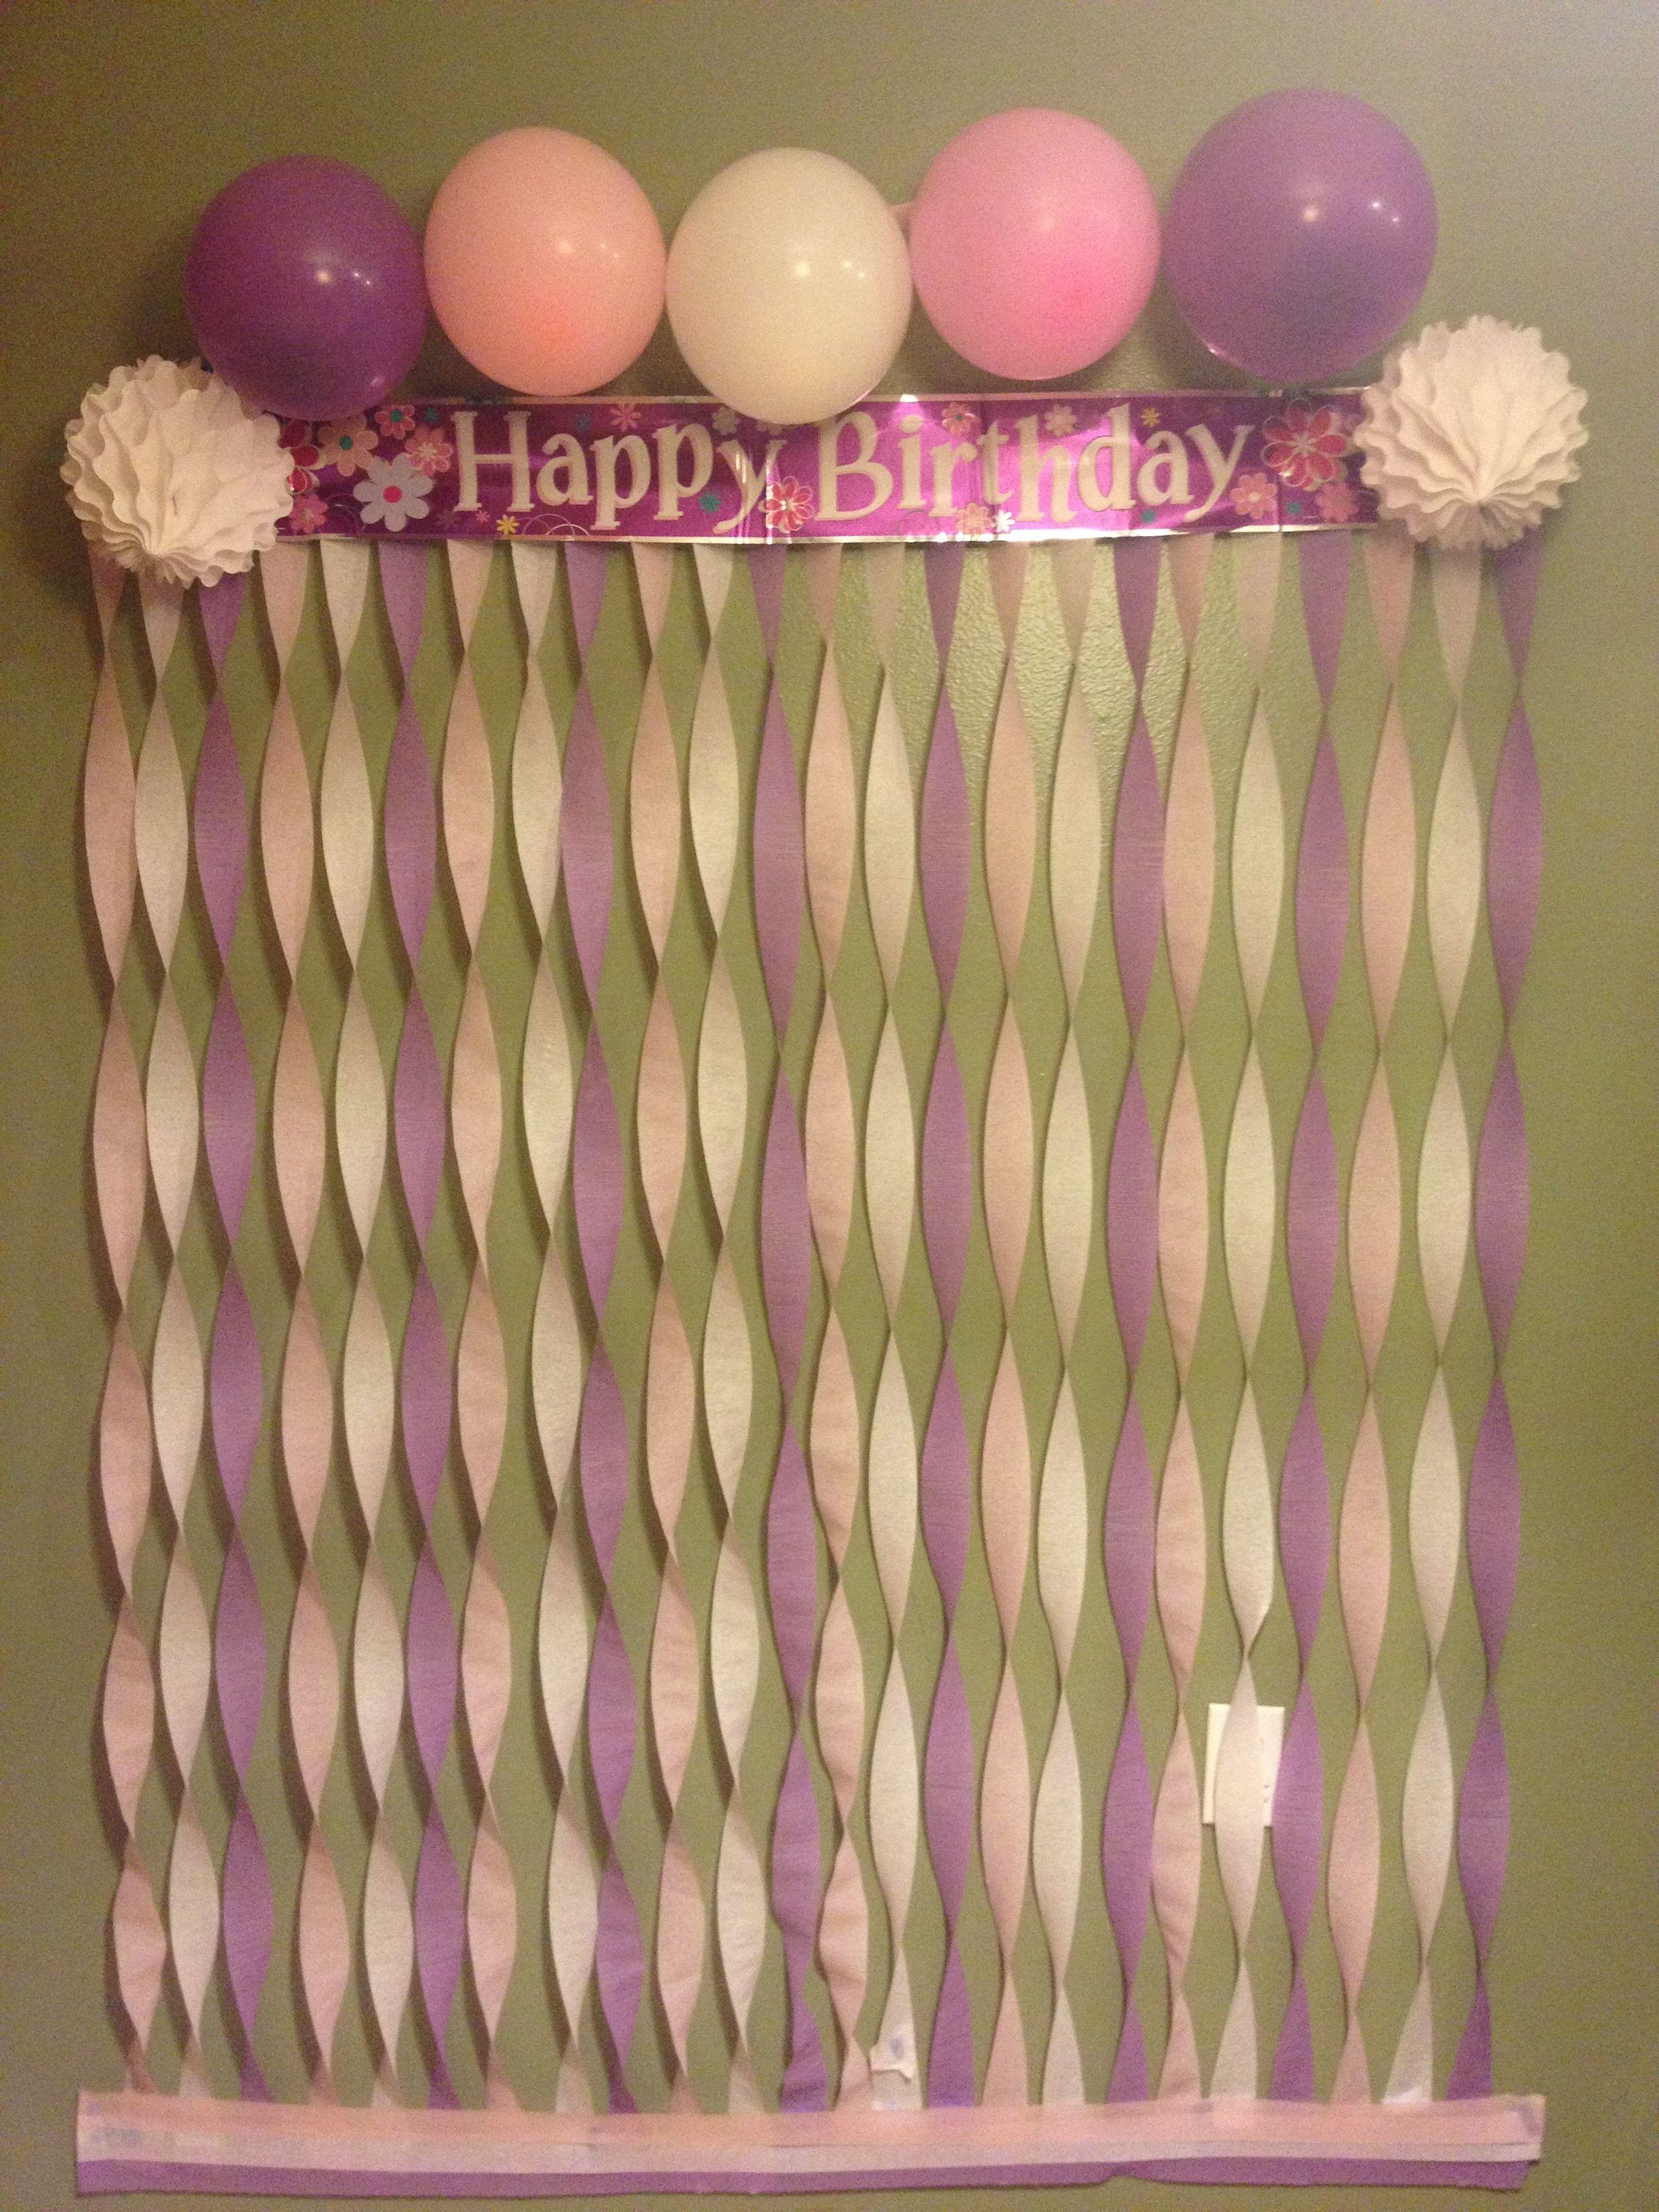 Pin By Lan Pok On Birthday Diy Photo Backdrop Birthday Diy Party Decorations